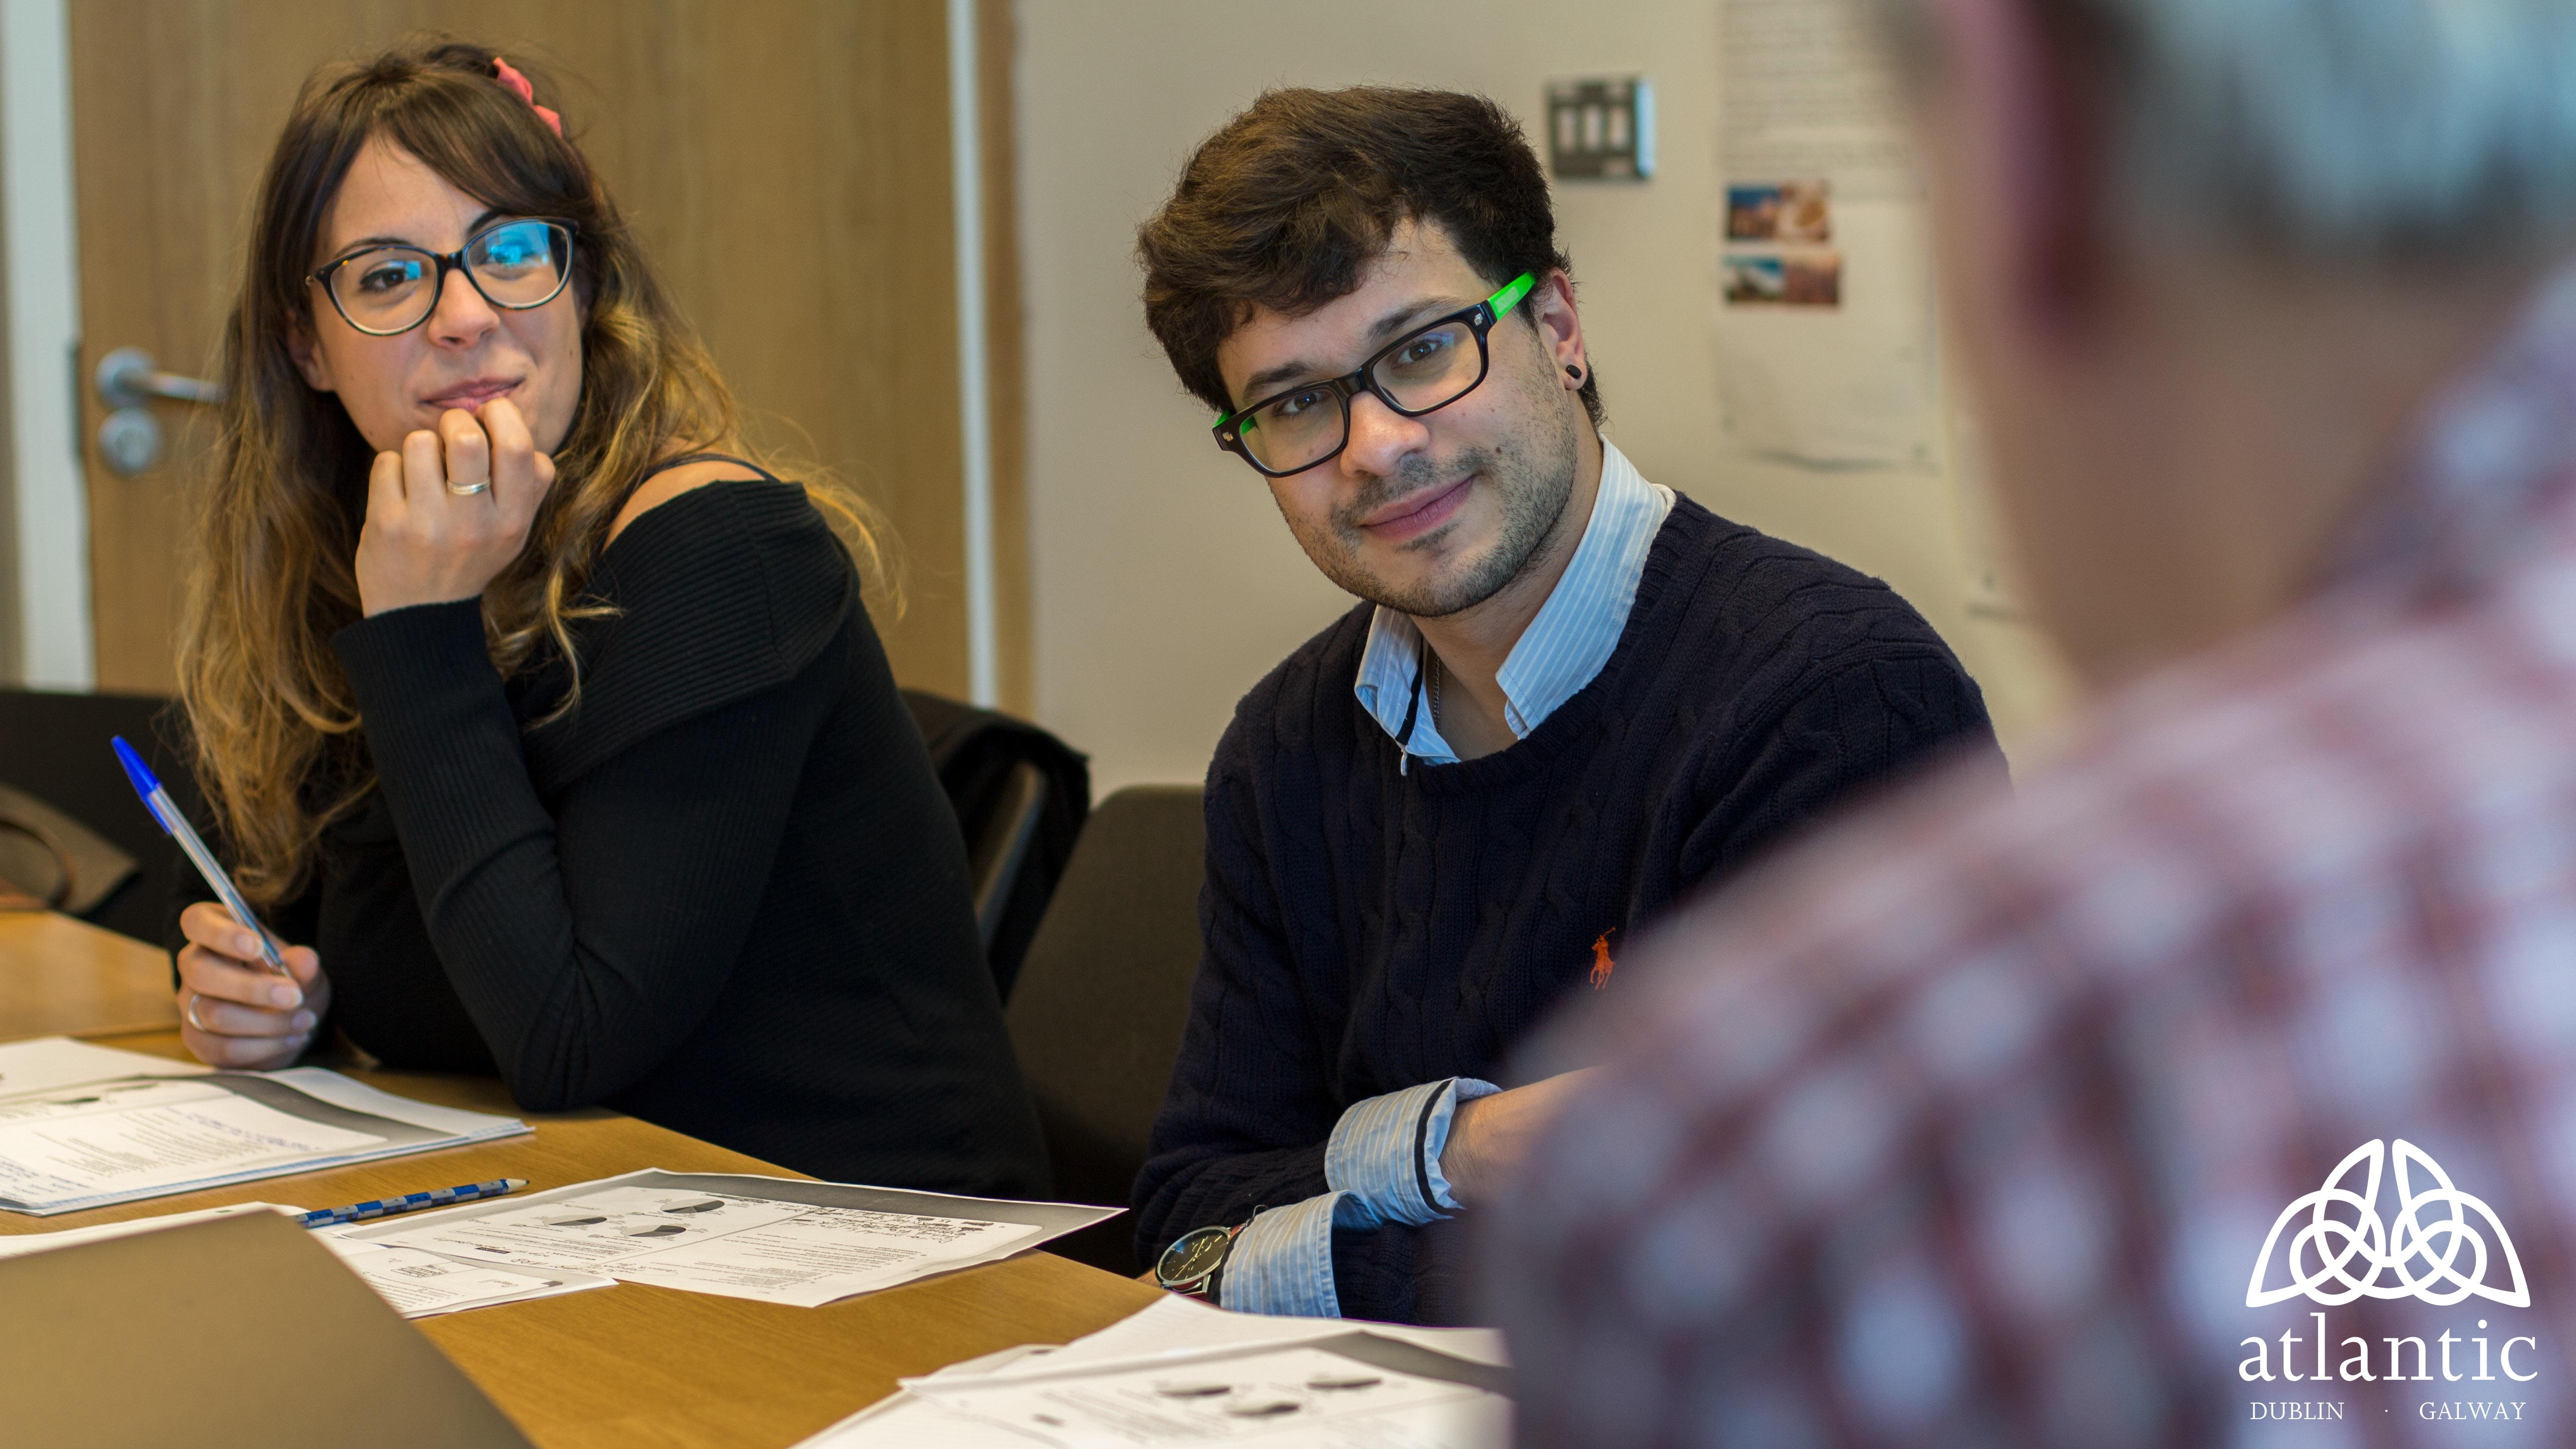 Why study IELTS at Atlantic Language School